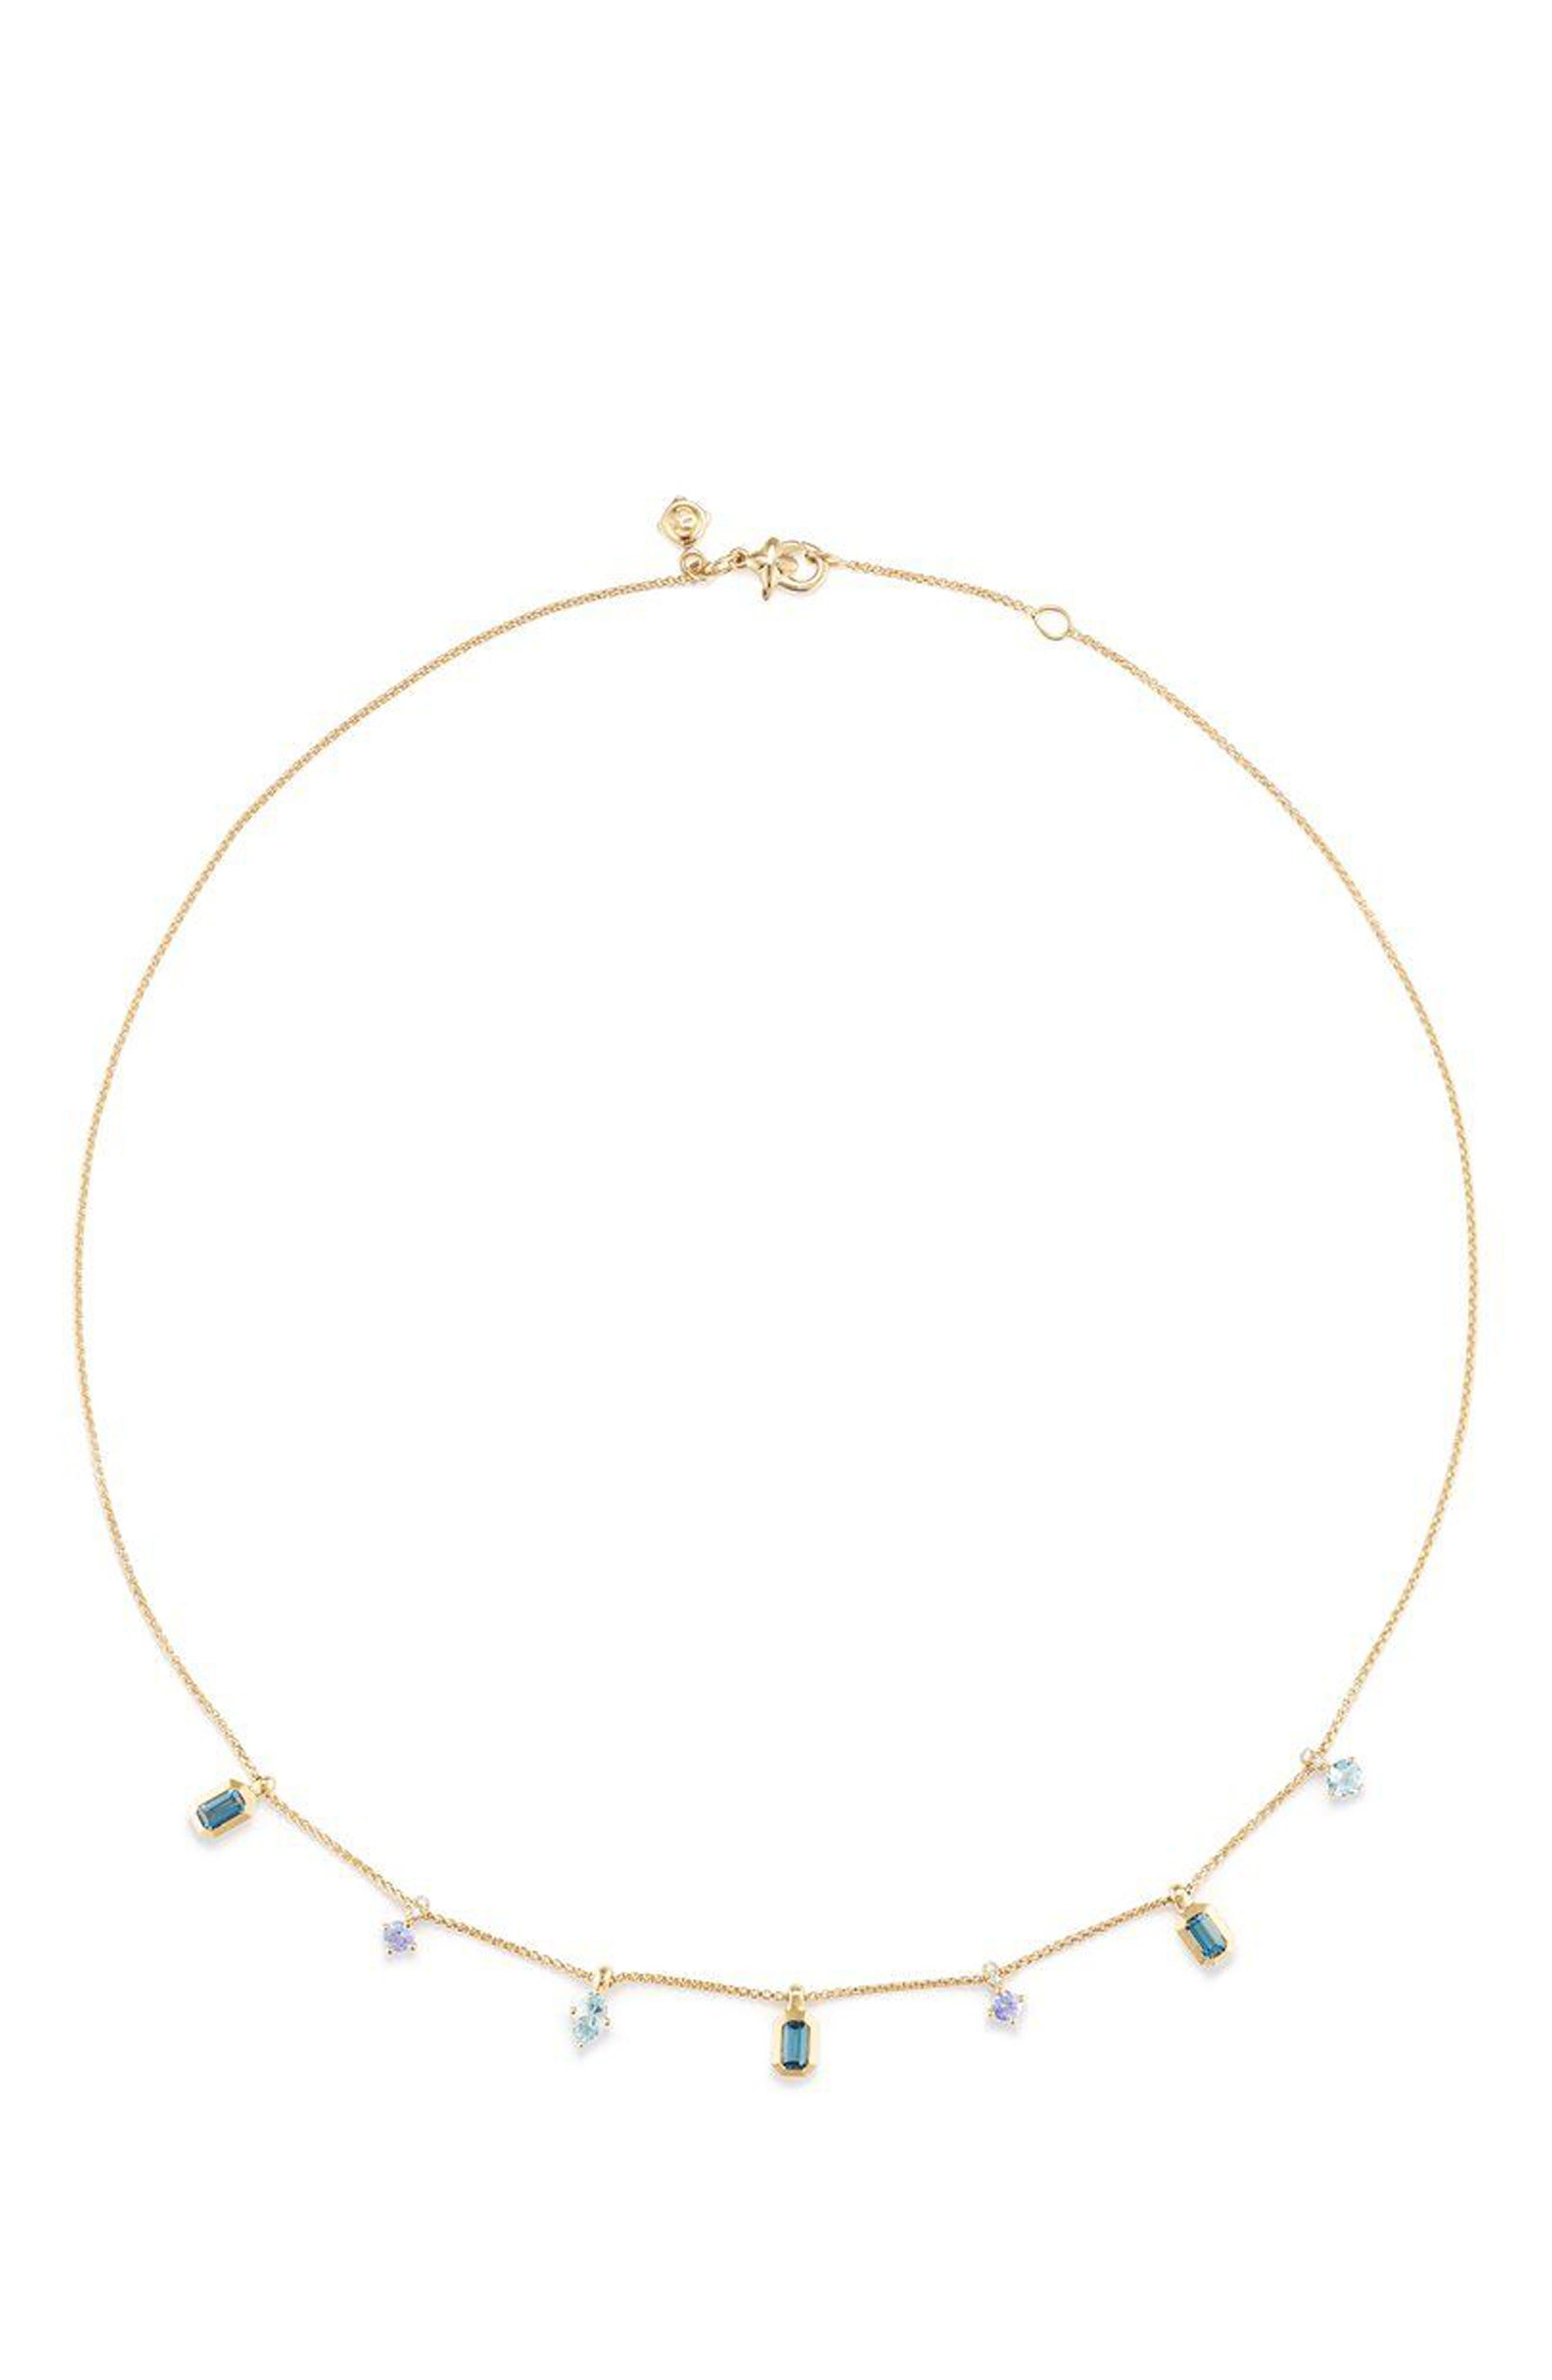 Novella Necklace in 18K Gold,                             Main thumbnail 1, color,                             GOLD/ DIAMOND/ BLUE TOPAZ